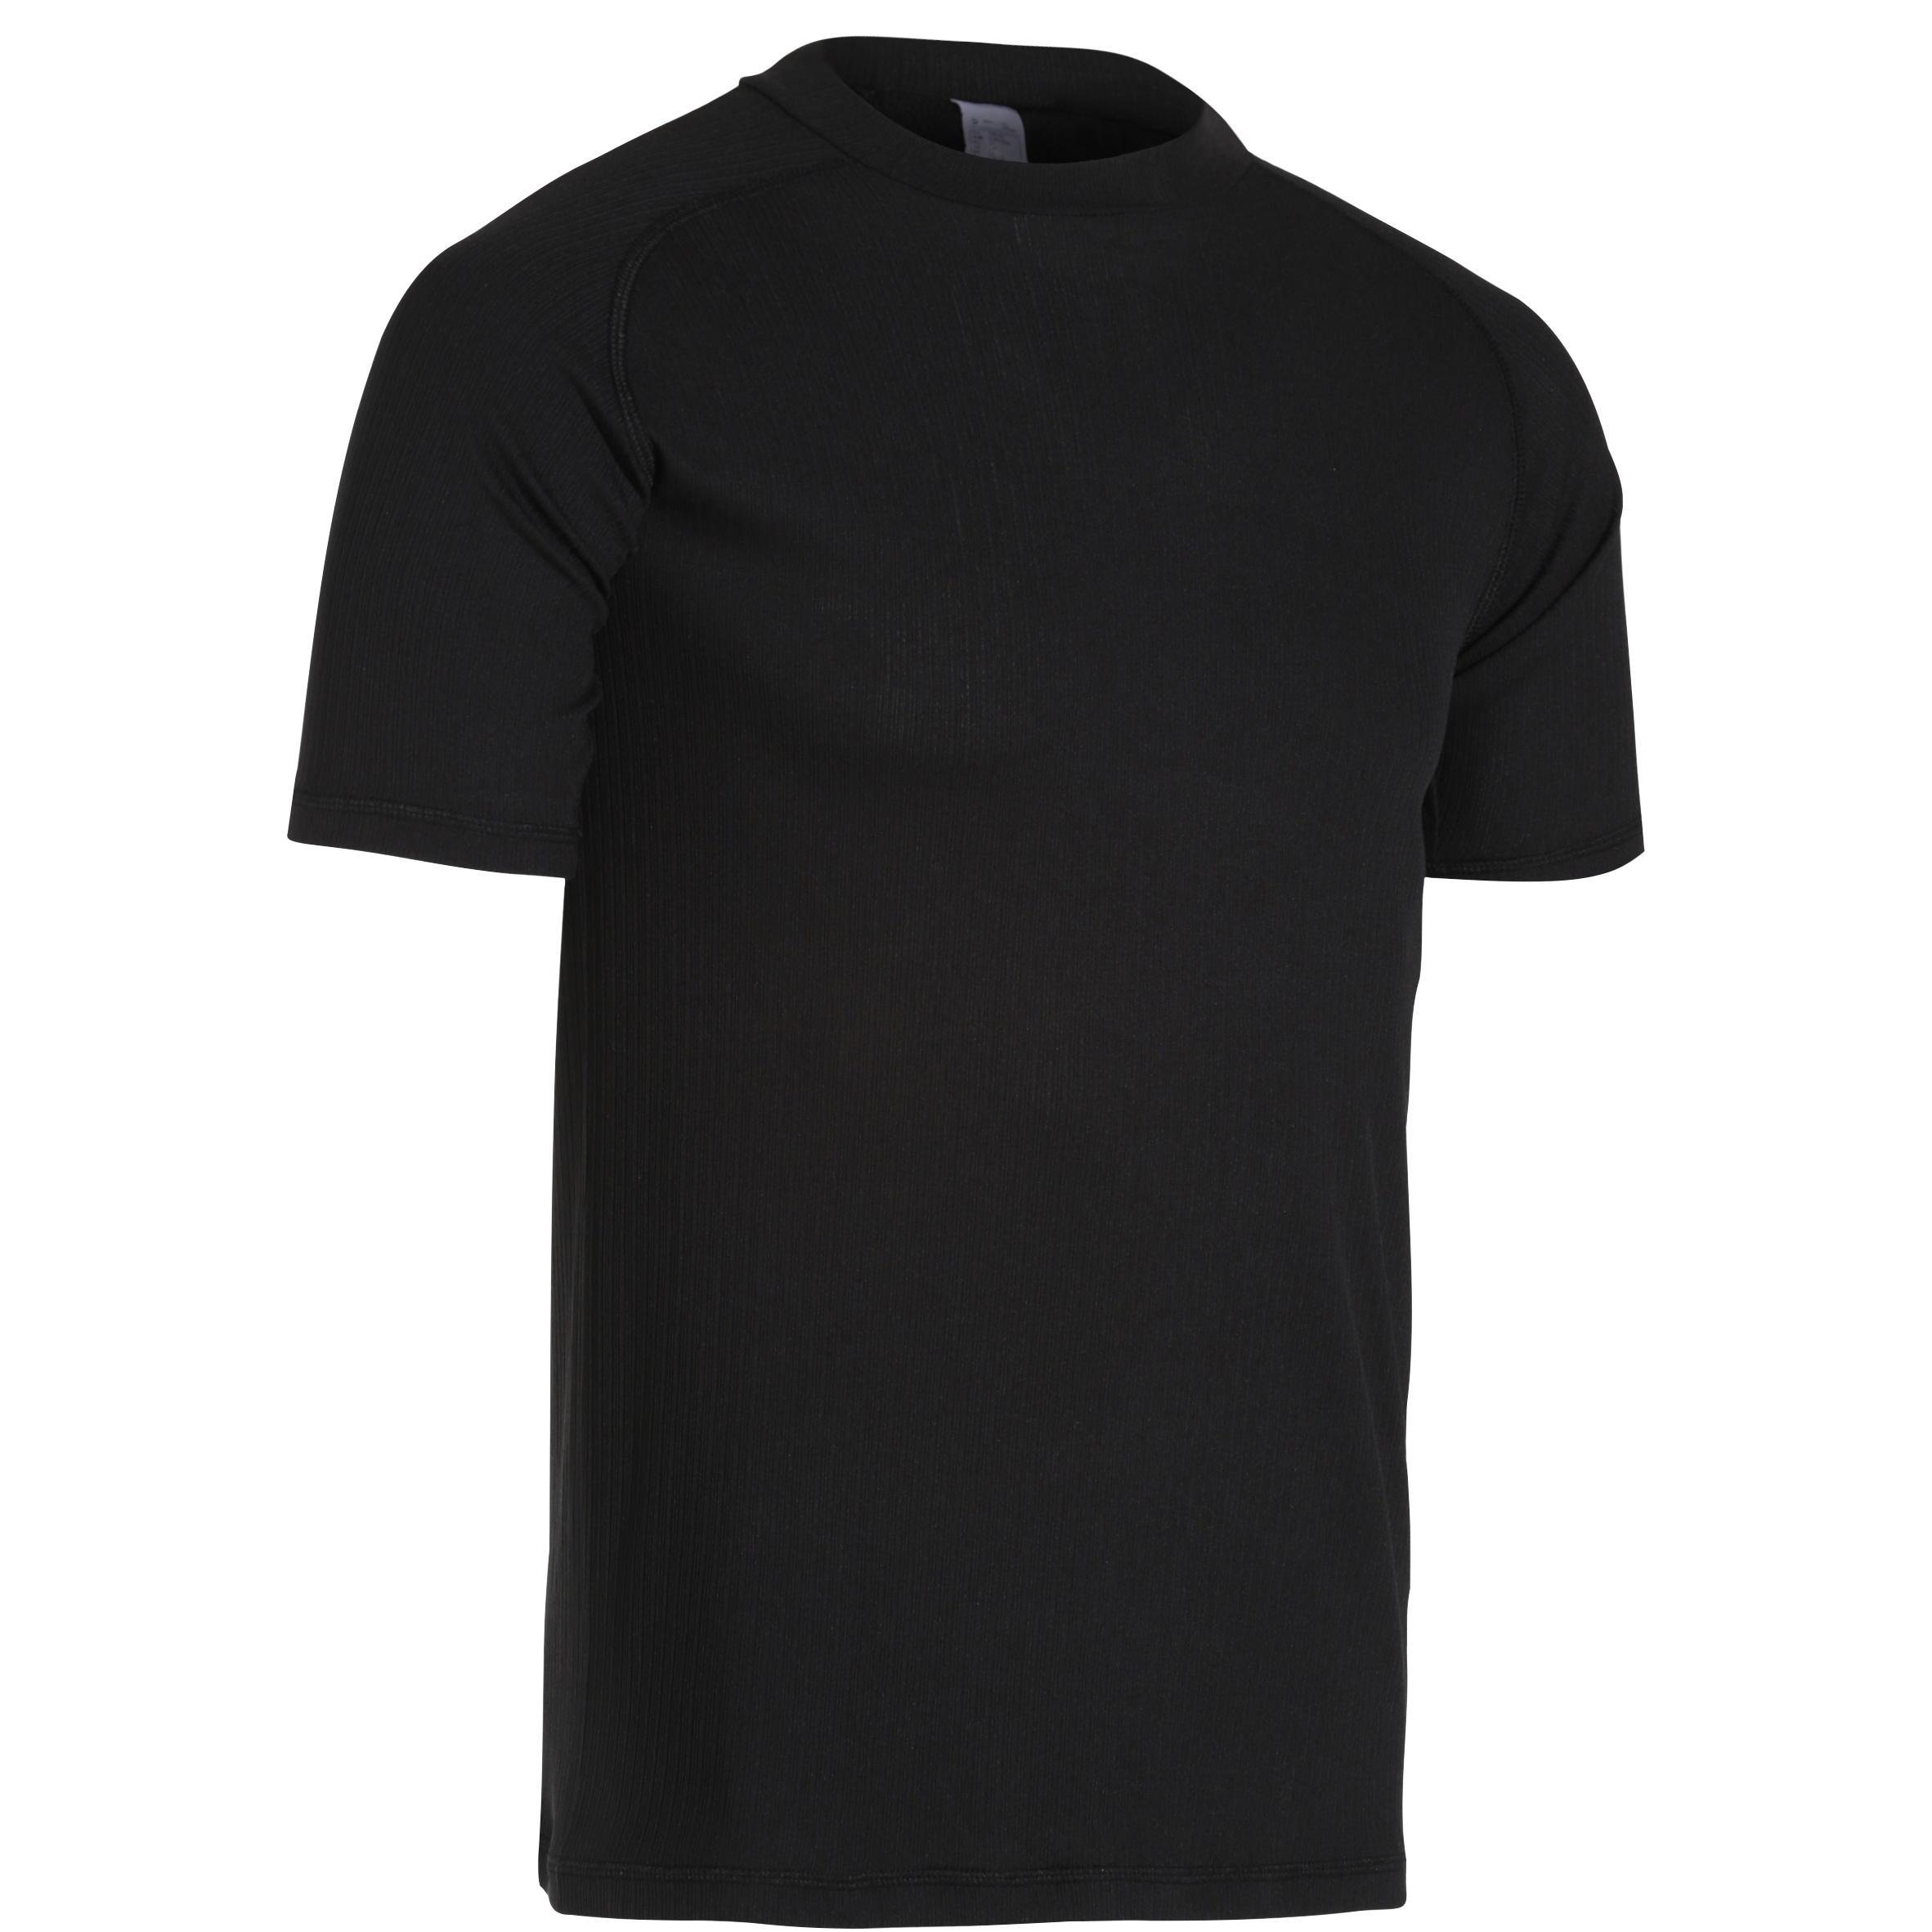 Radunterwäsche kurzarm RC 100 schwarz